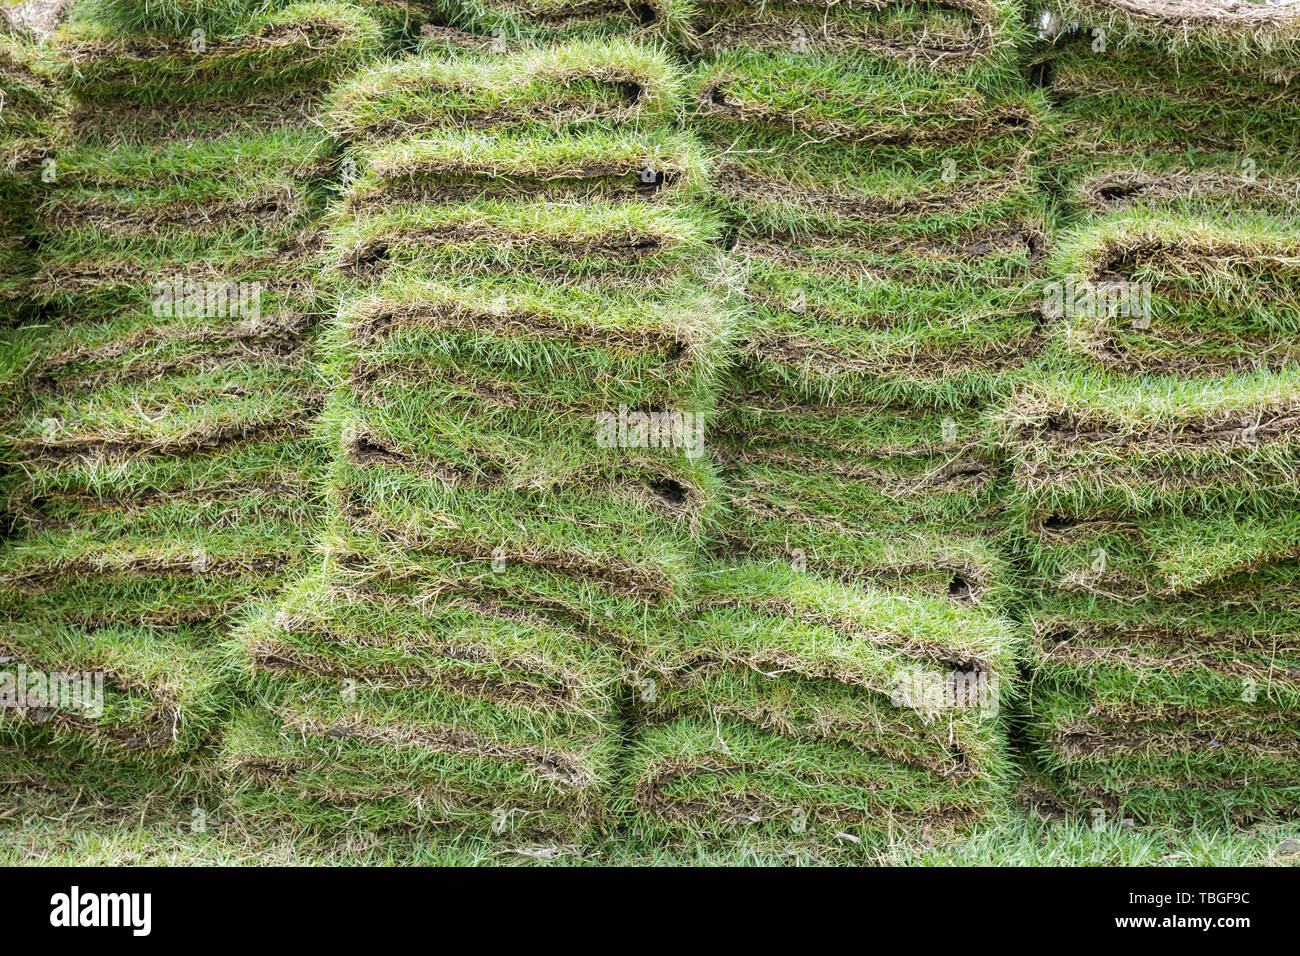 heap of natural grass turfs for garden installing - Stock Image